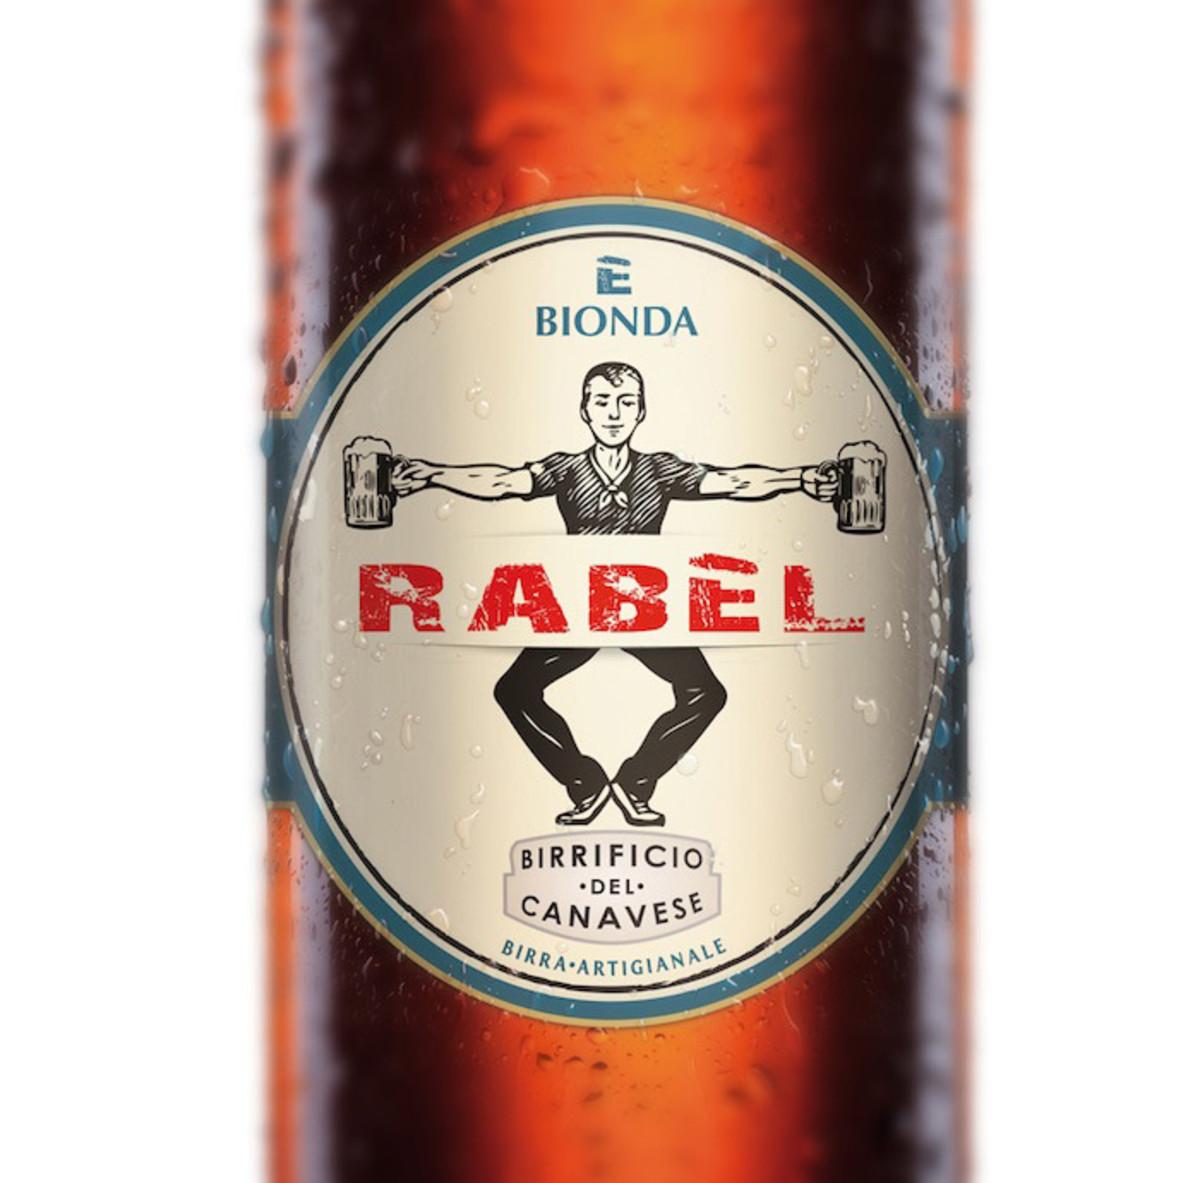 Rabel-bottiglia-etichetta-close-up